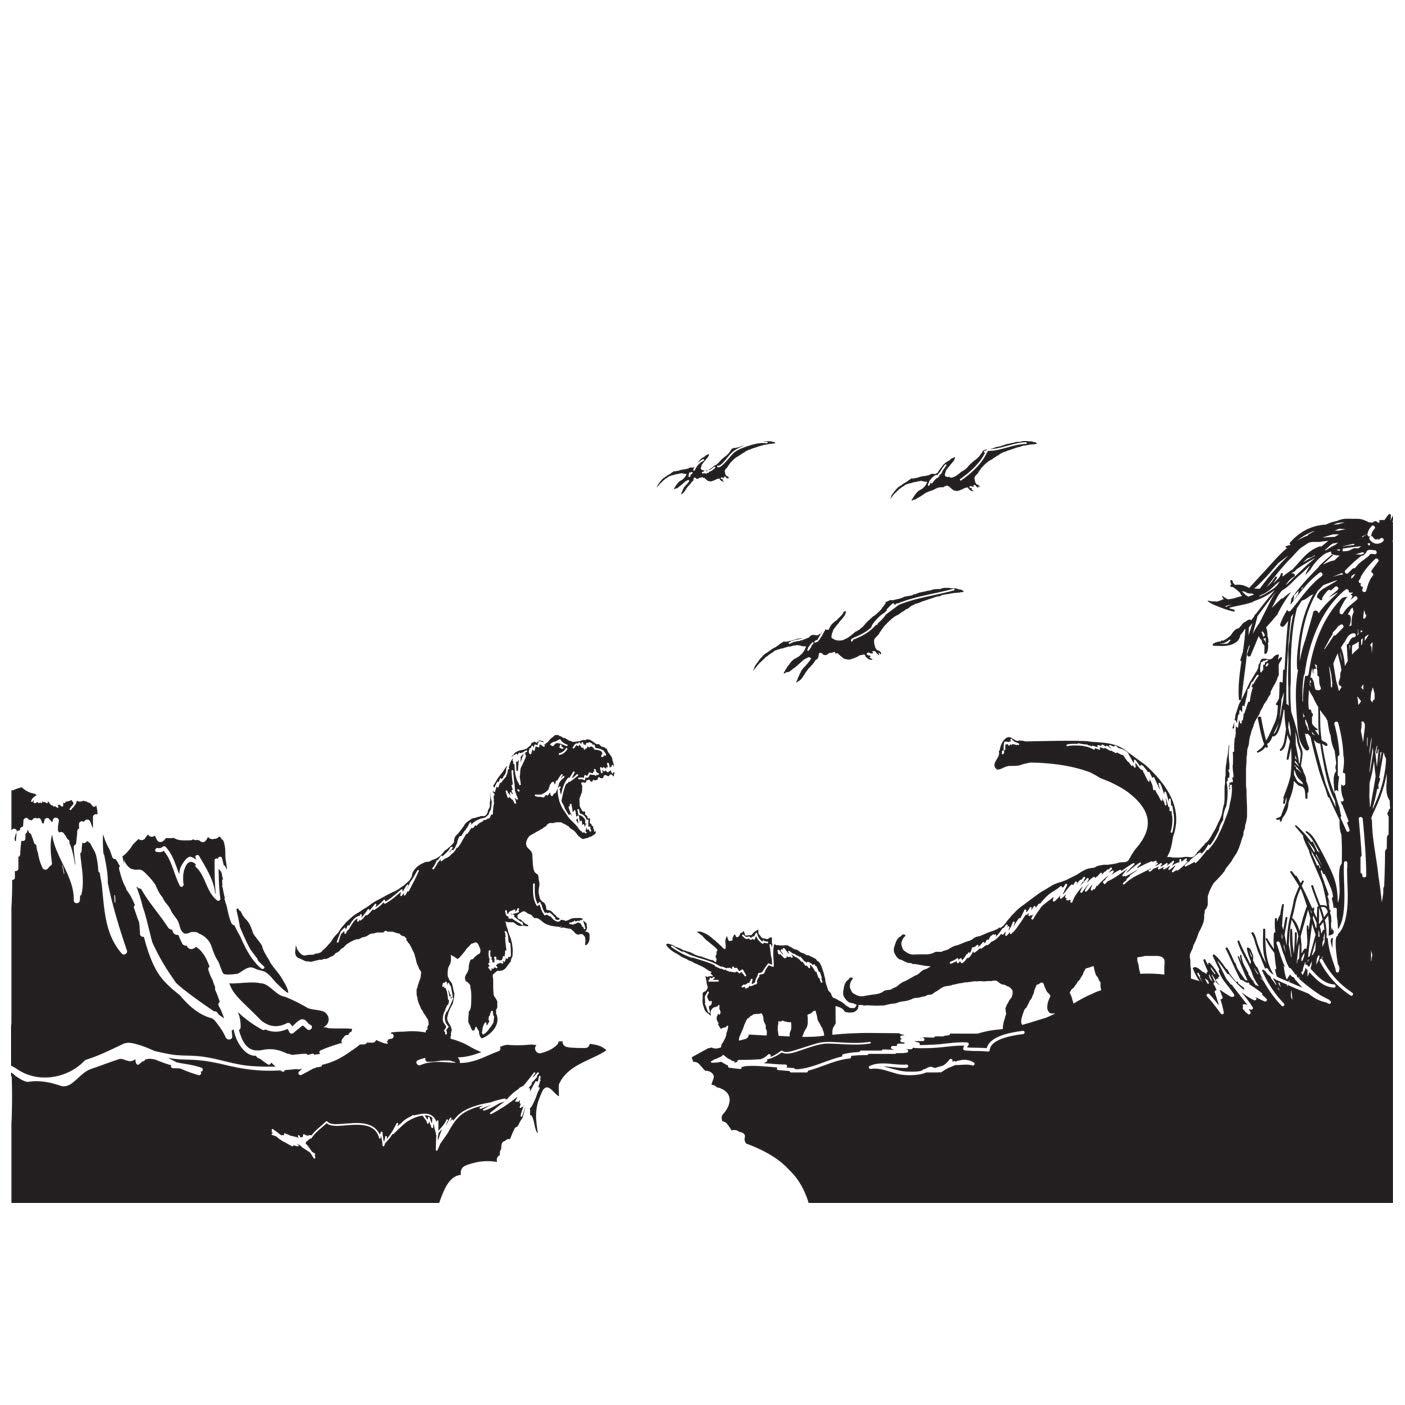 Vinilo Decorativo Pared [08DI1MFI] Jurassic park dinosaurios